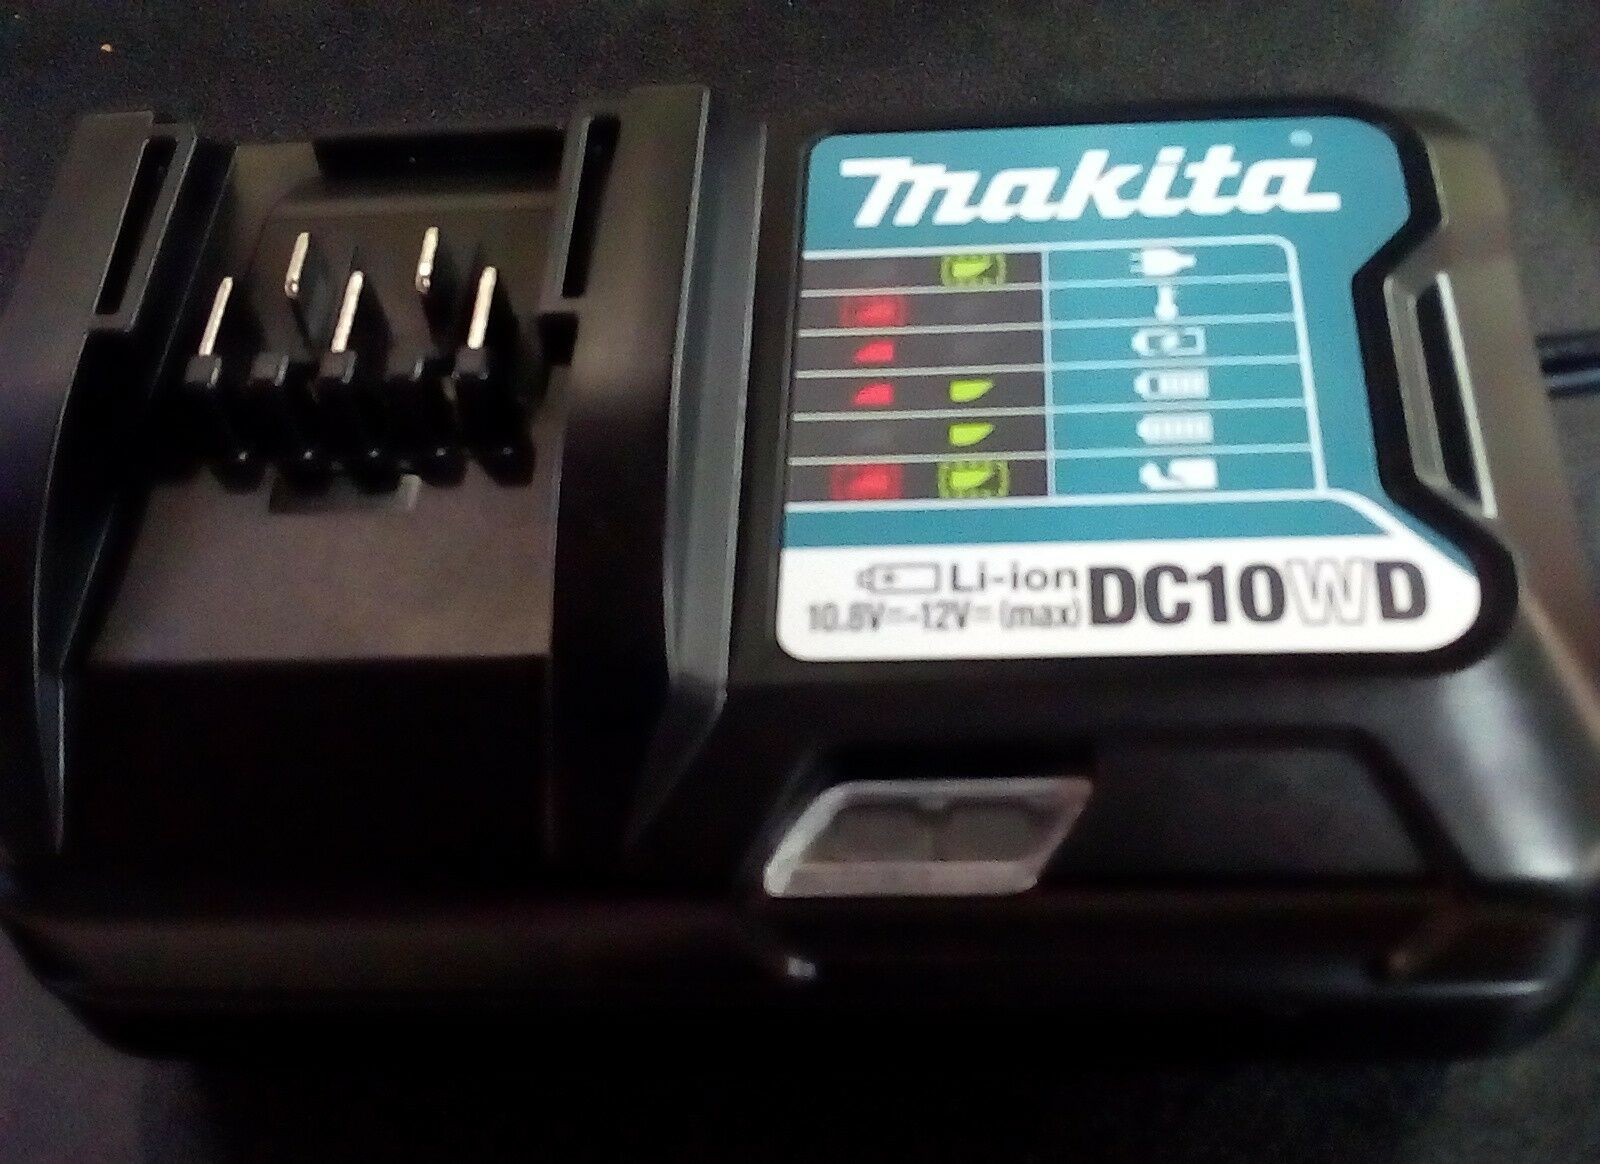 197340-6 Original Makita Charger 10.8V-12V DC10WD